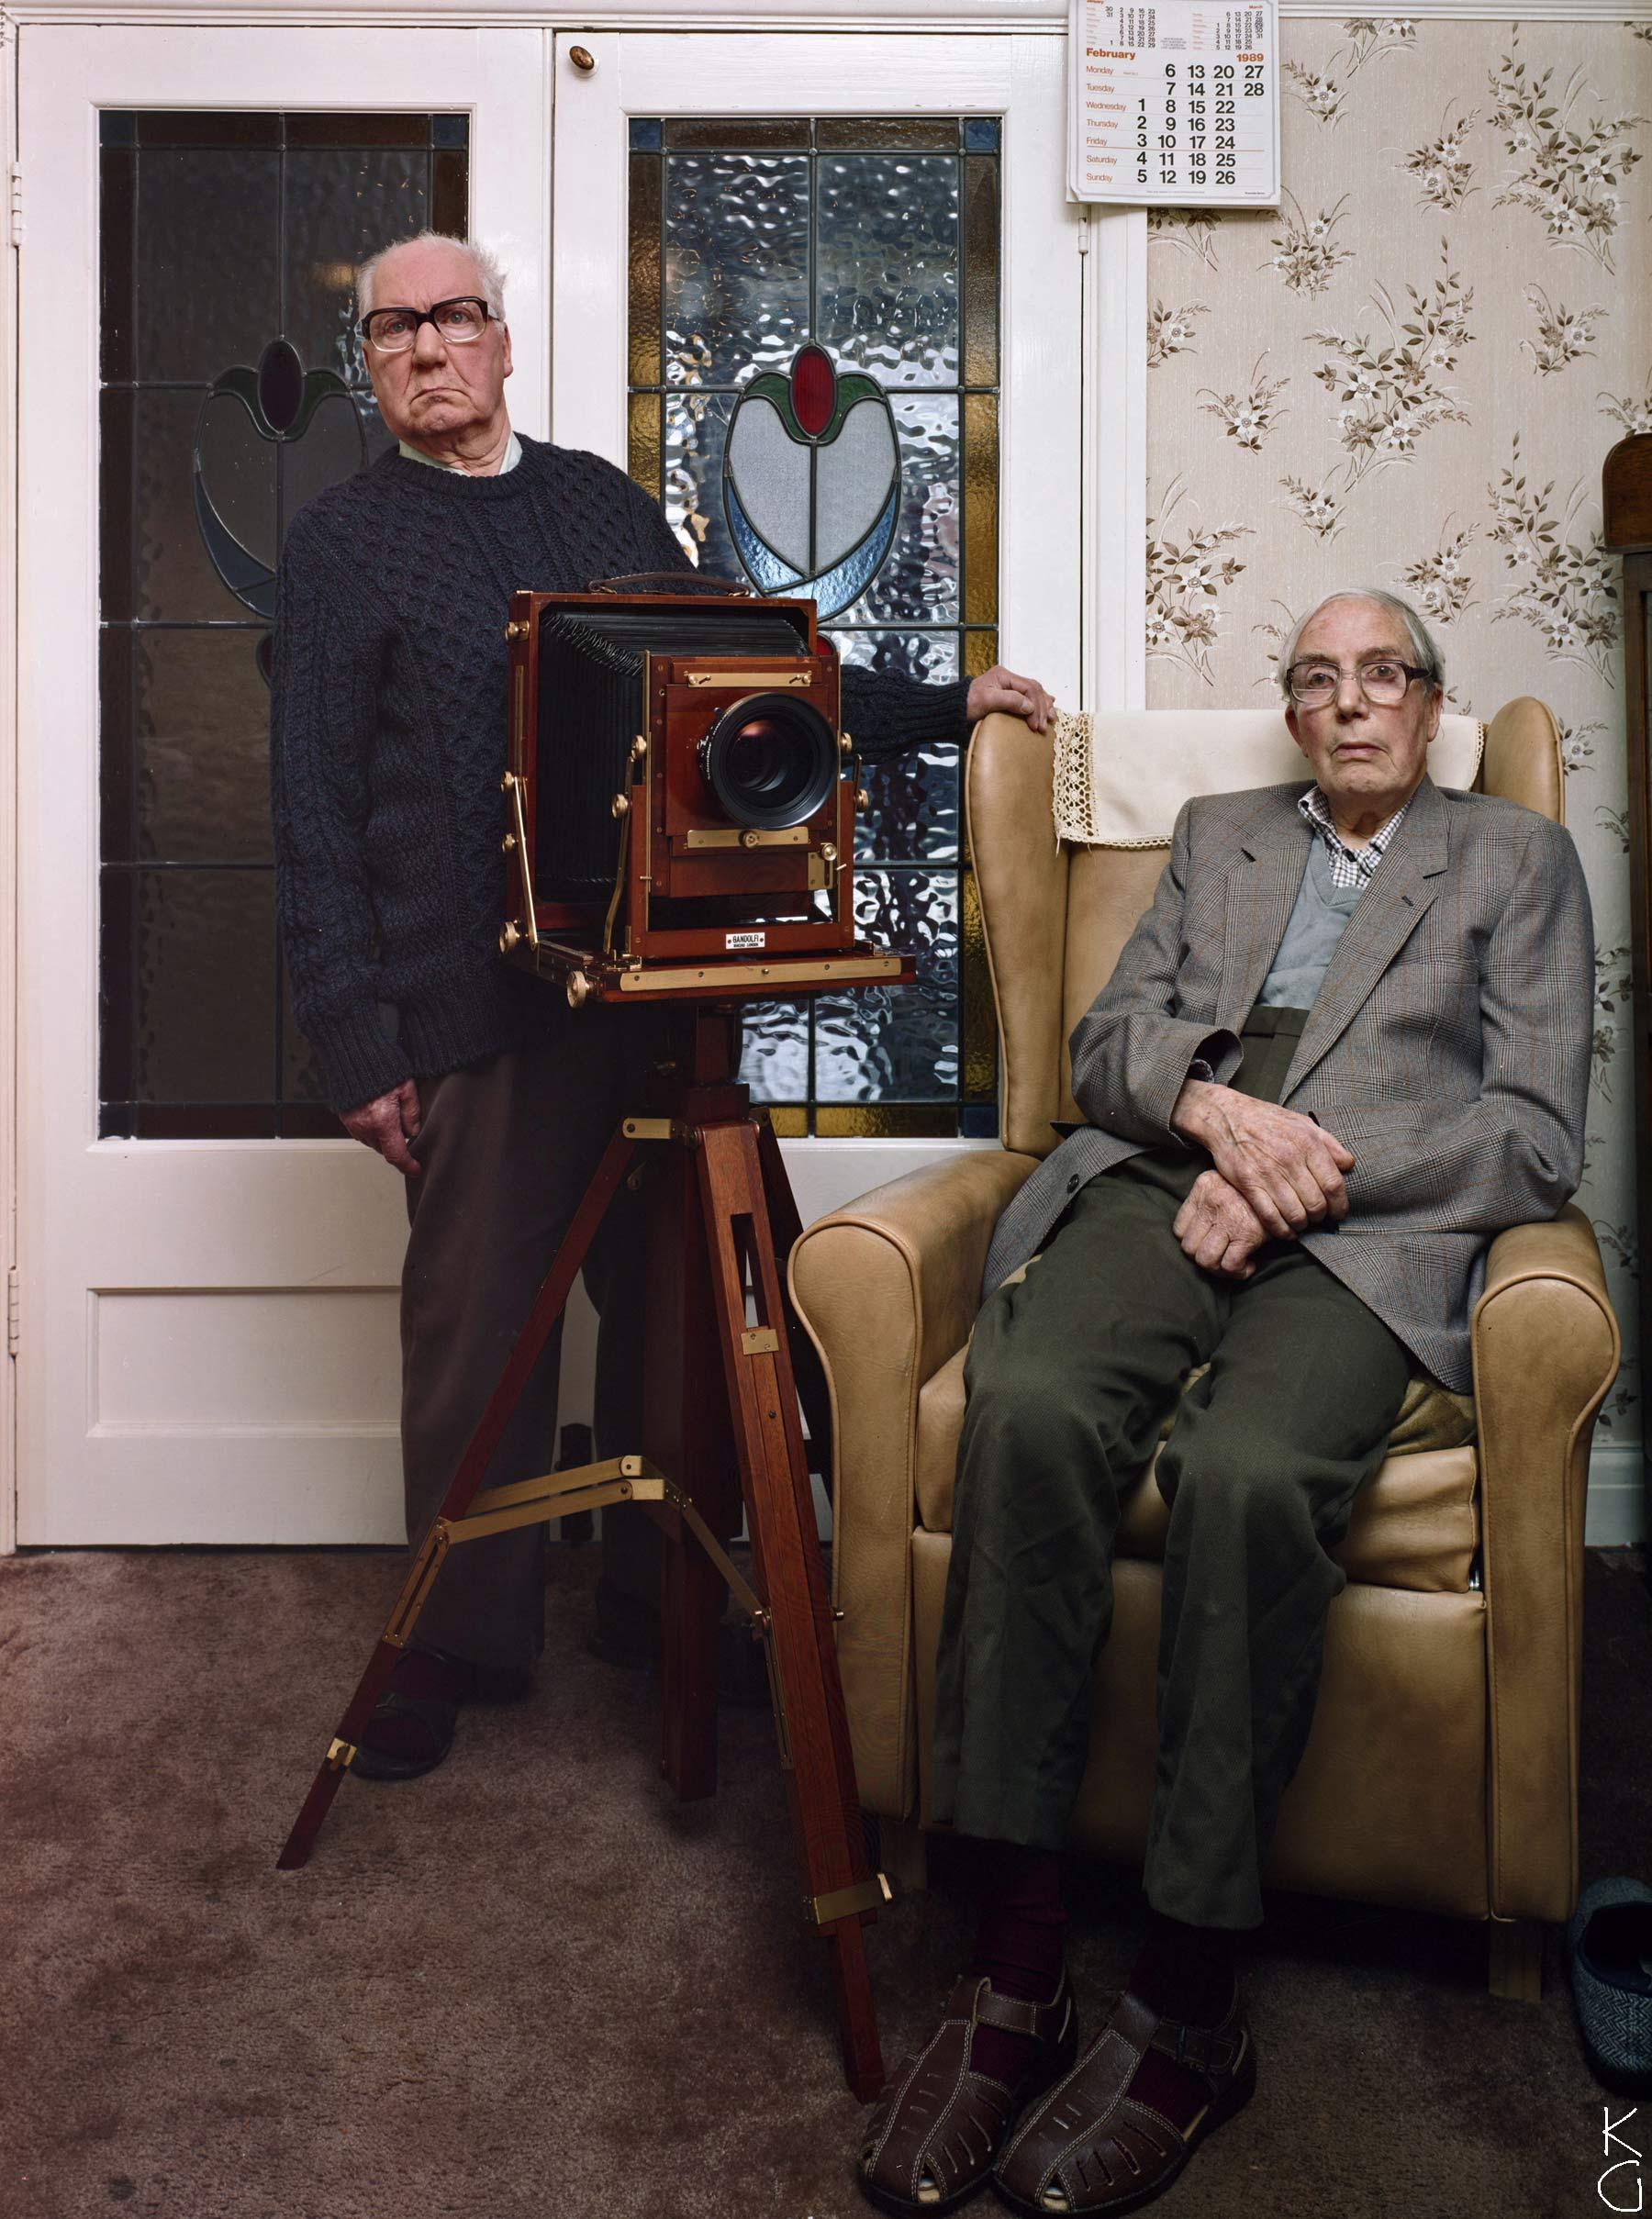 Arthur & Fred Gandolfi, Peckham